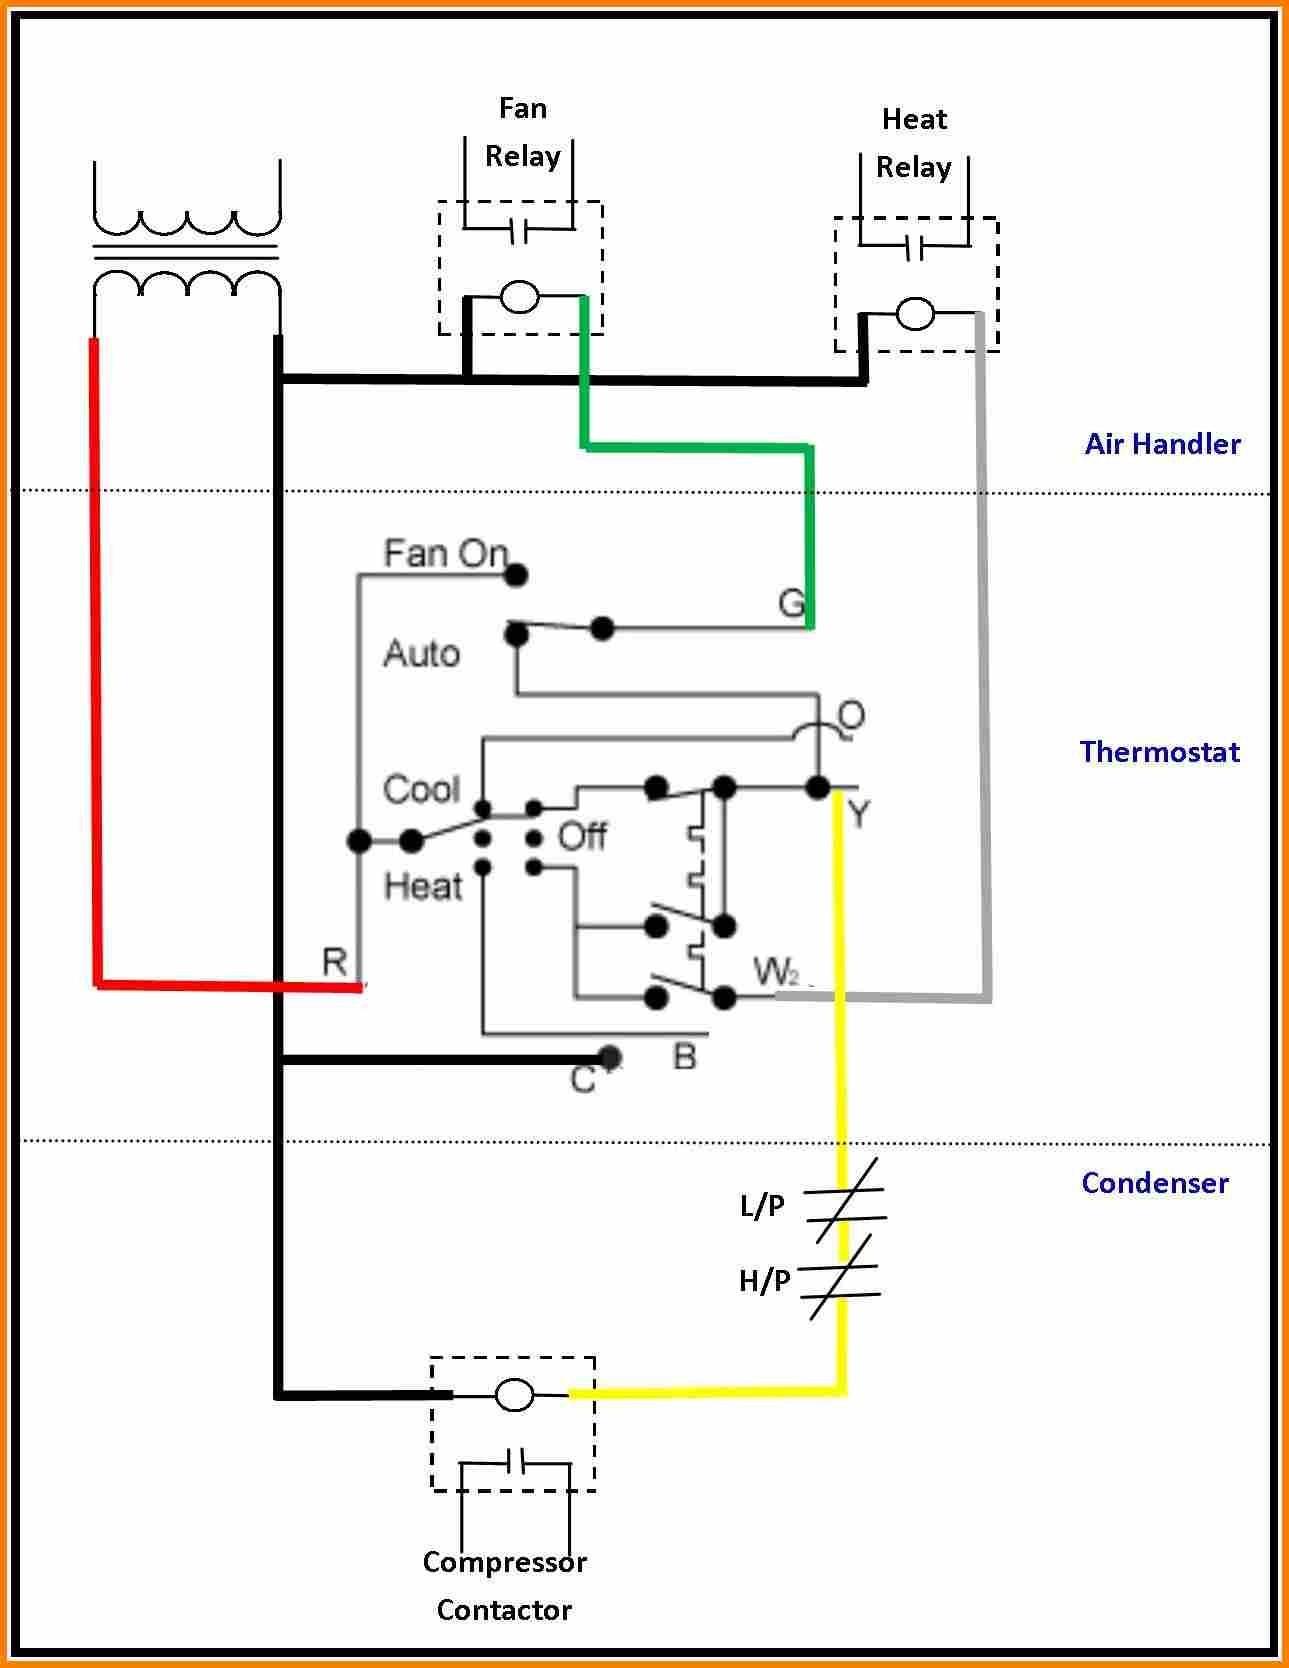 Ac Contactor Wiring Diagram Ac Hvac Wiring Free Download Diagrams Schematics Best Diagram Afif